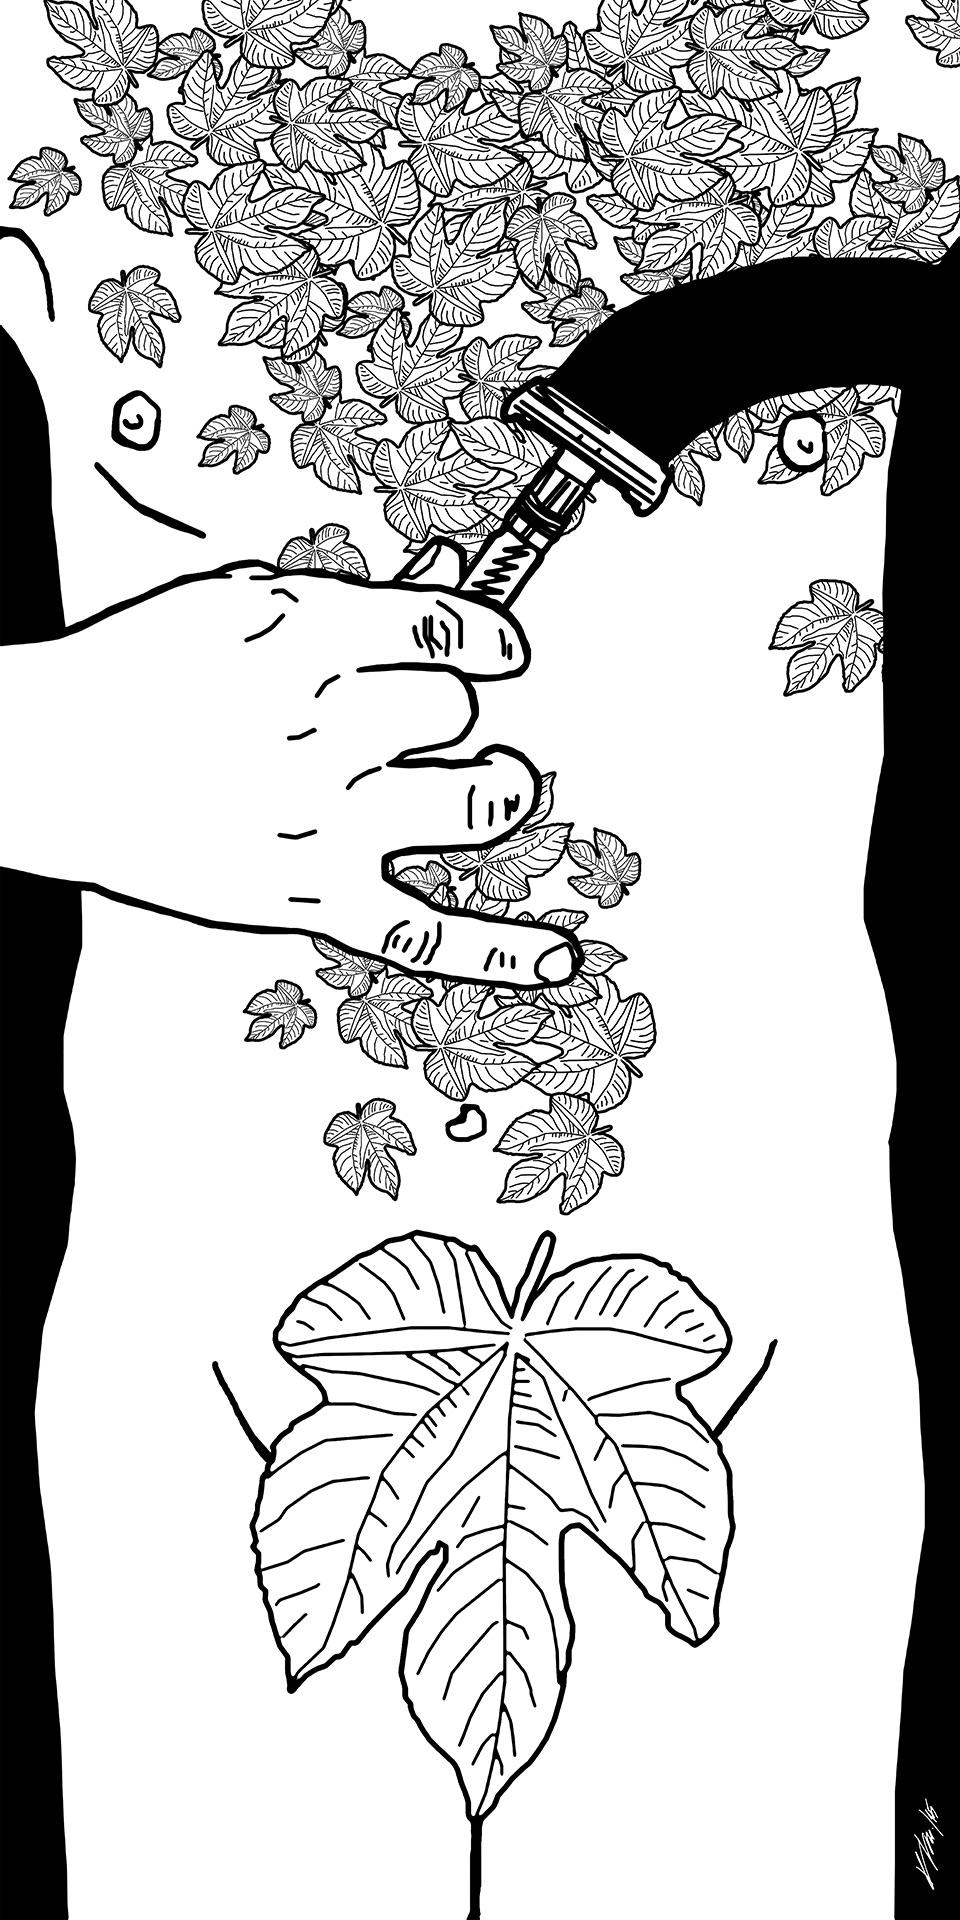 Illustration-Conflict